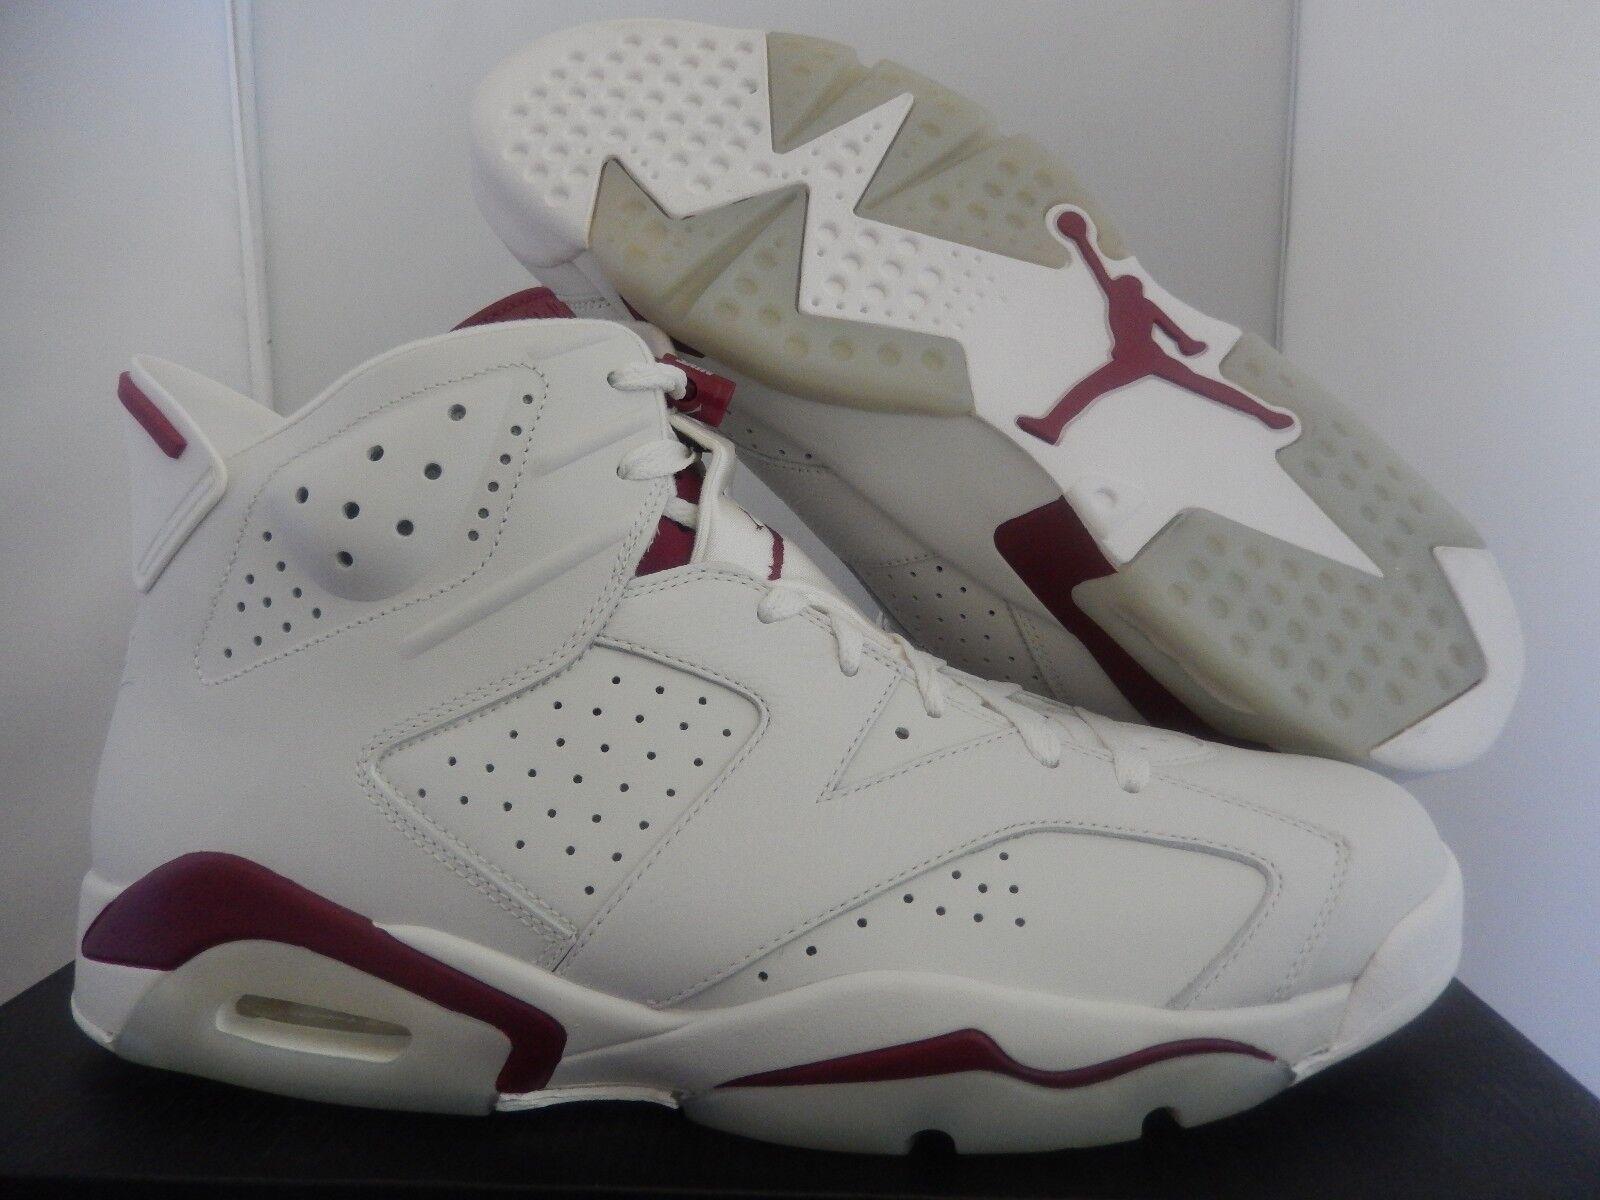 Nike Air Jordan 6 Retro [384664116] BlancoMarrón [384664116] Retro 644400